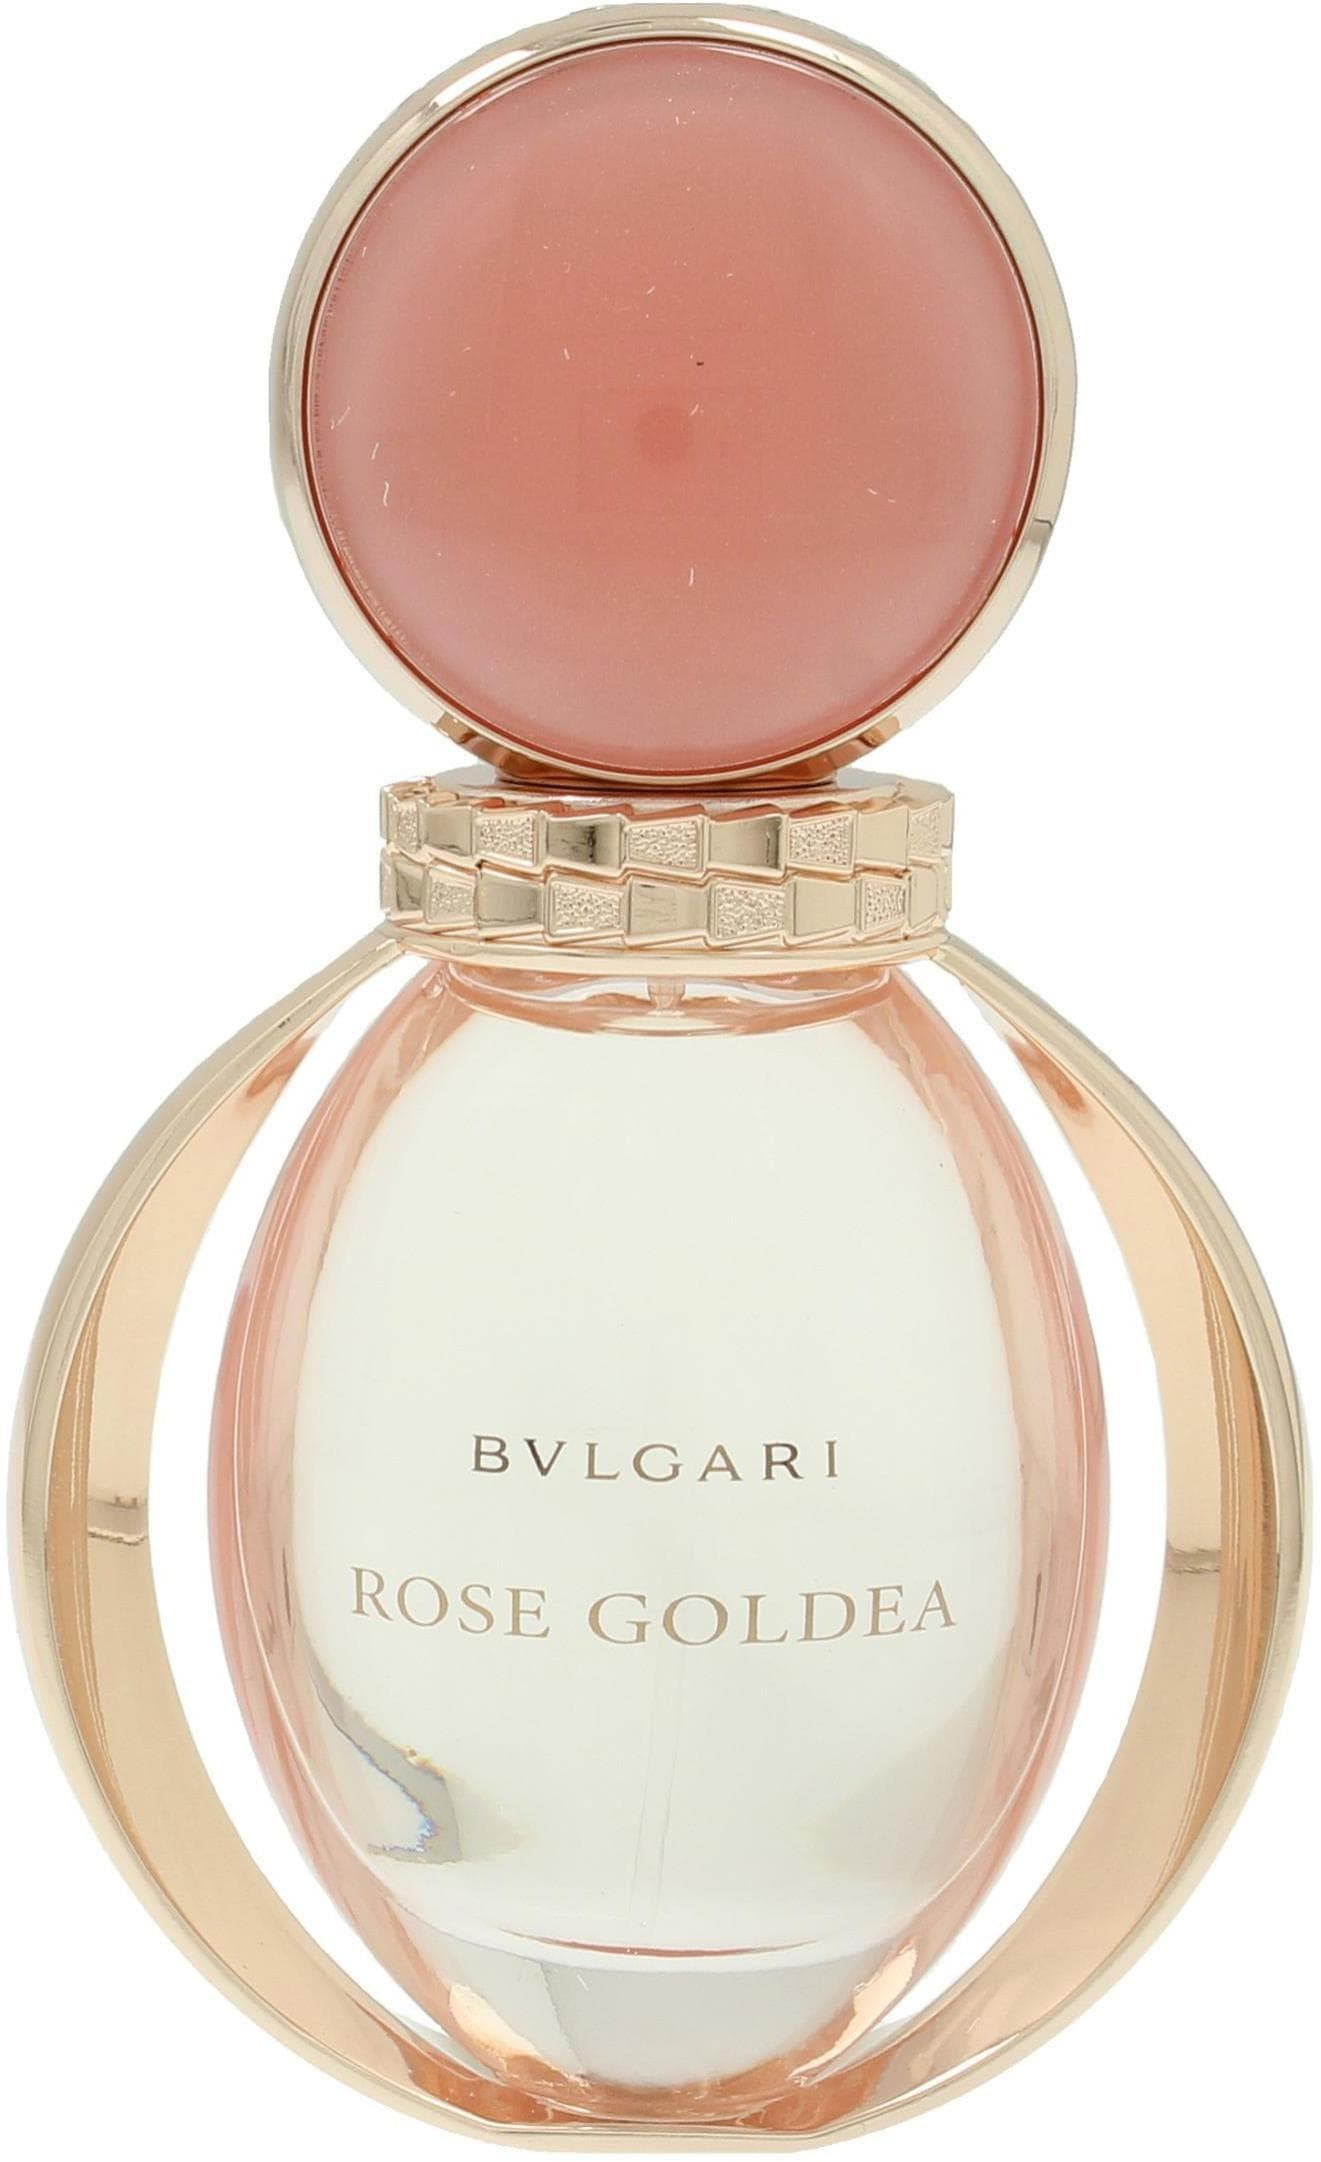 Bvlgari, »Rose Goldea«, Eau de Parfum